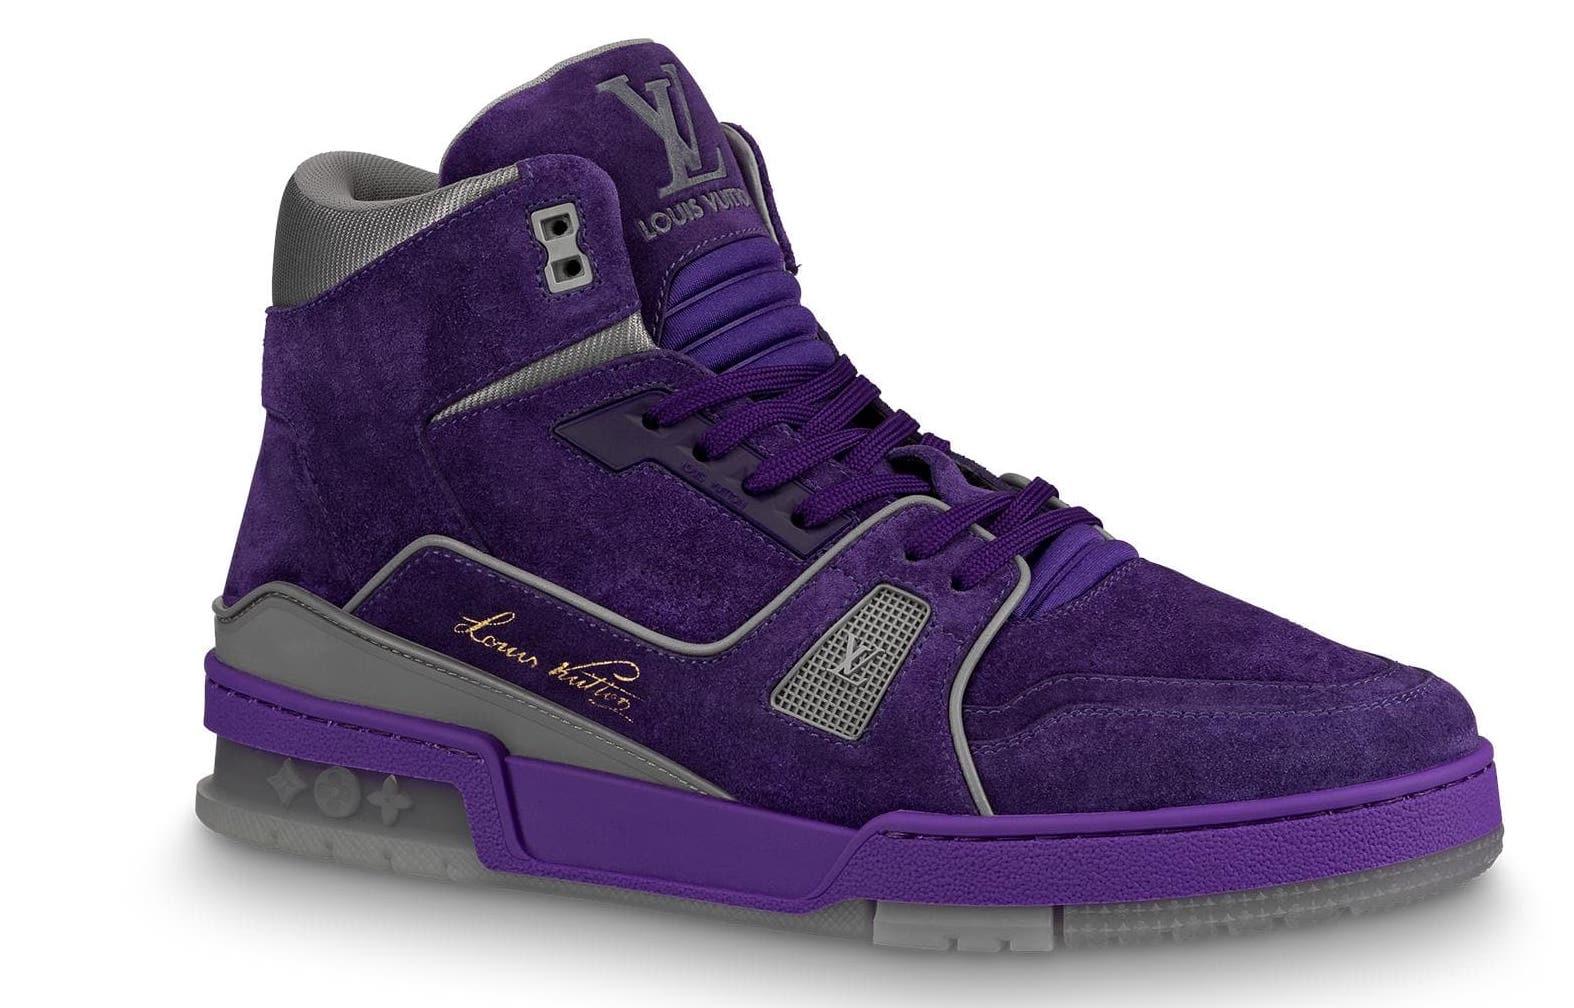 Louis Vuitton Trainer Purple - 1A5DUB